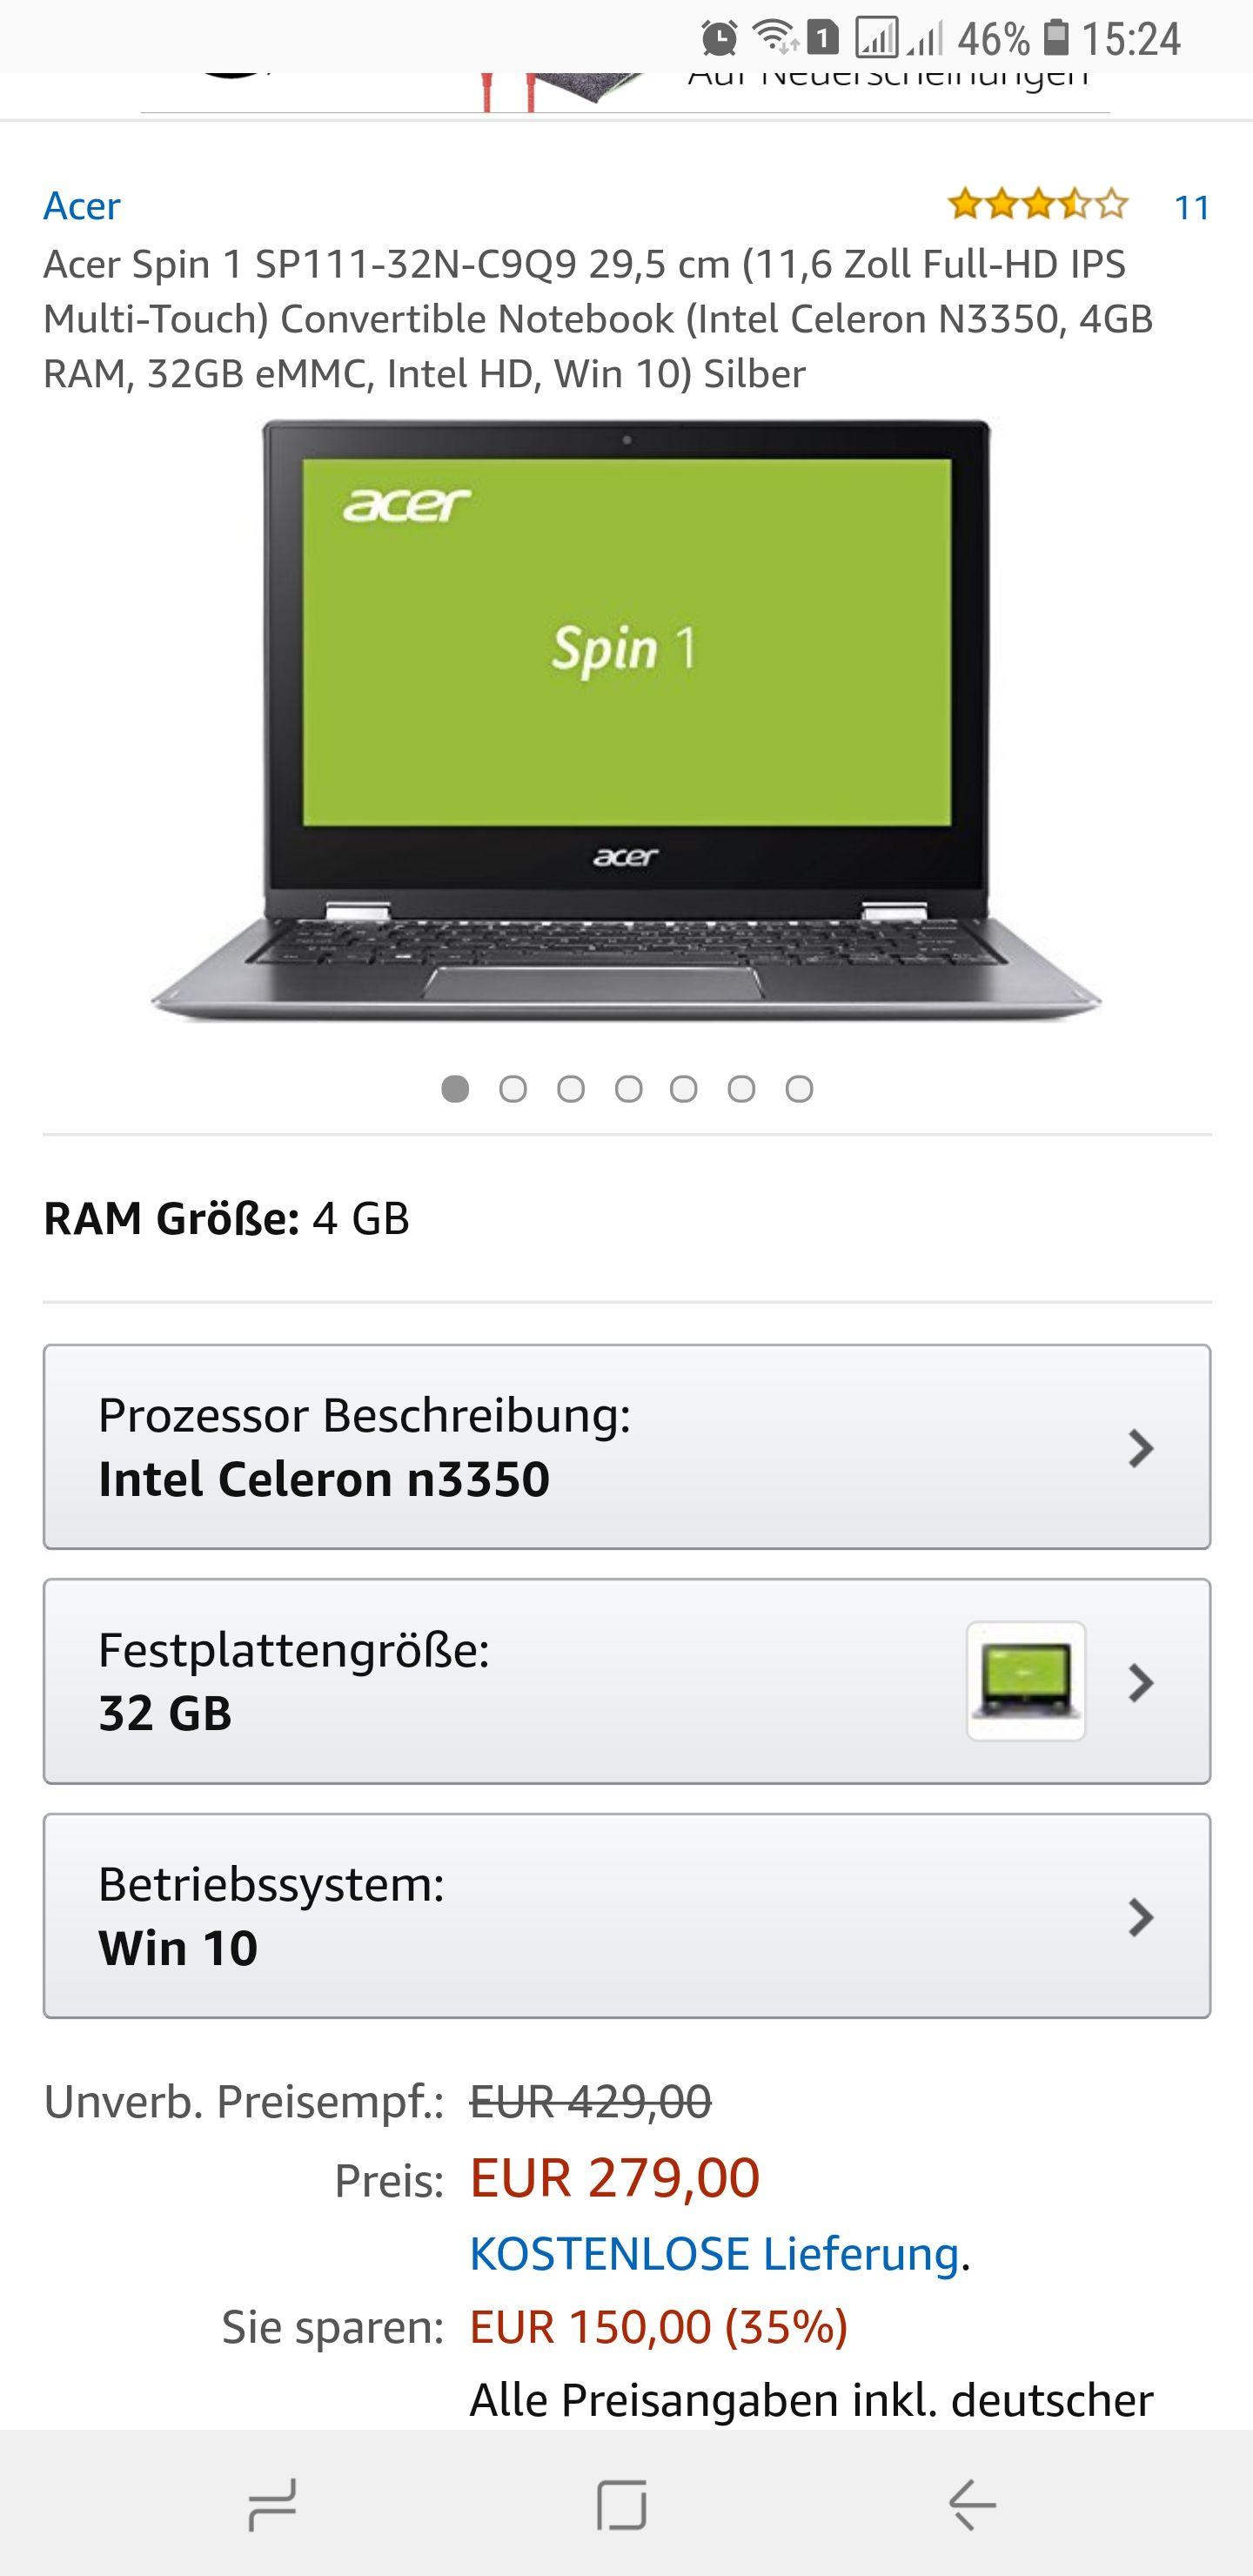 [amazon] Acer Spin 1 SP111-32N-C9Q9 Convertible Notebook/Intel Celeron N3340/4GB Ram/ 32GB eMMC/Versandkostenfrei